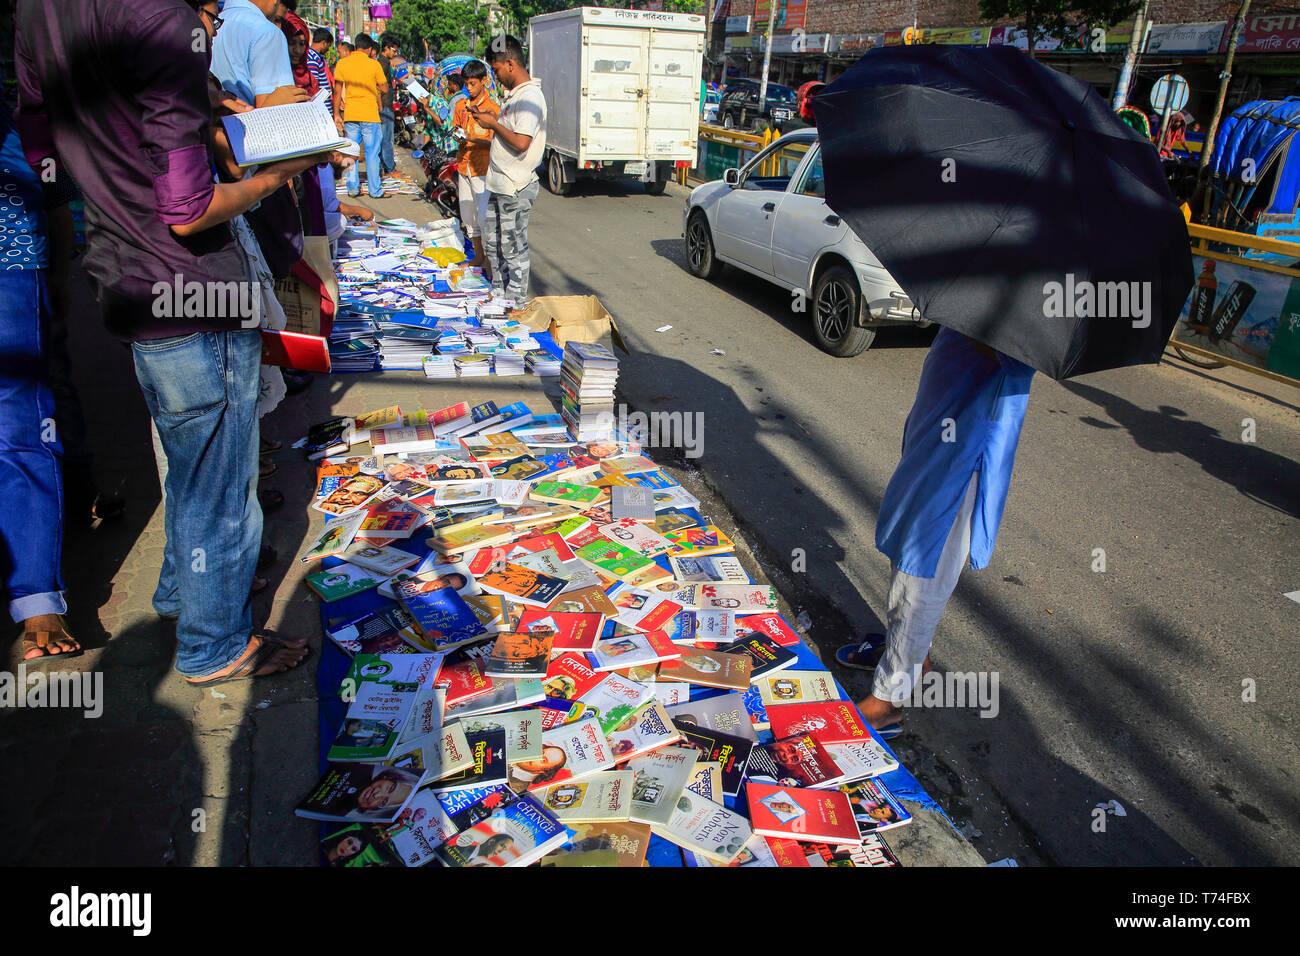 Book shop on the footpath at Nilkhet in Dhaka, Bangladesh - Stock Image